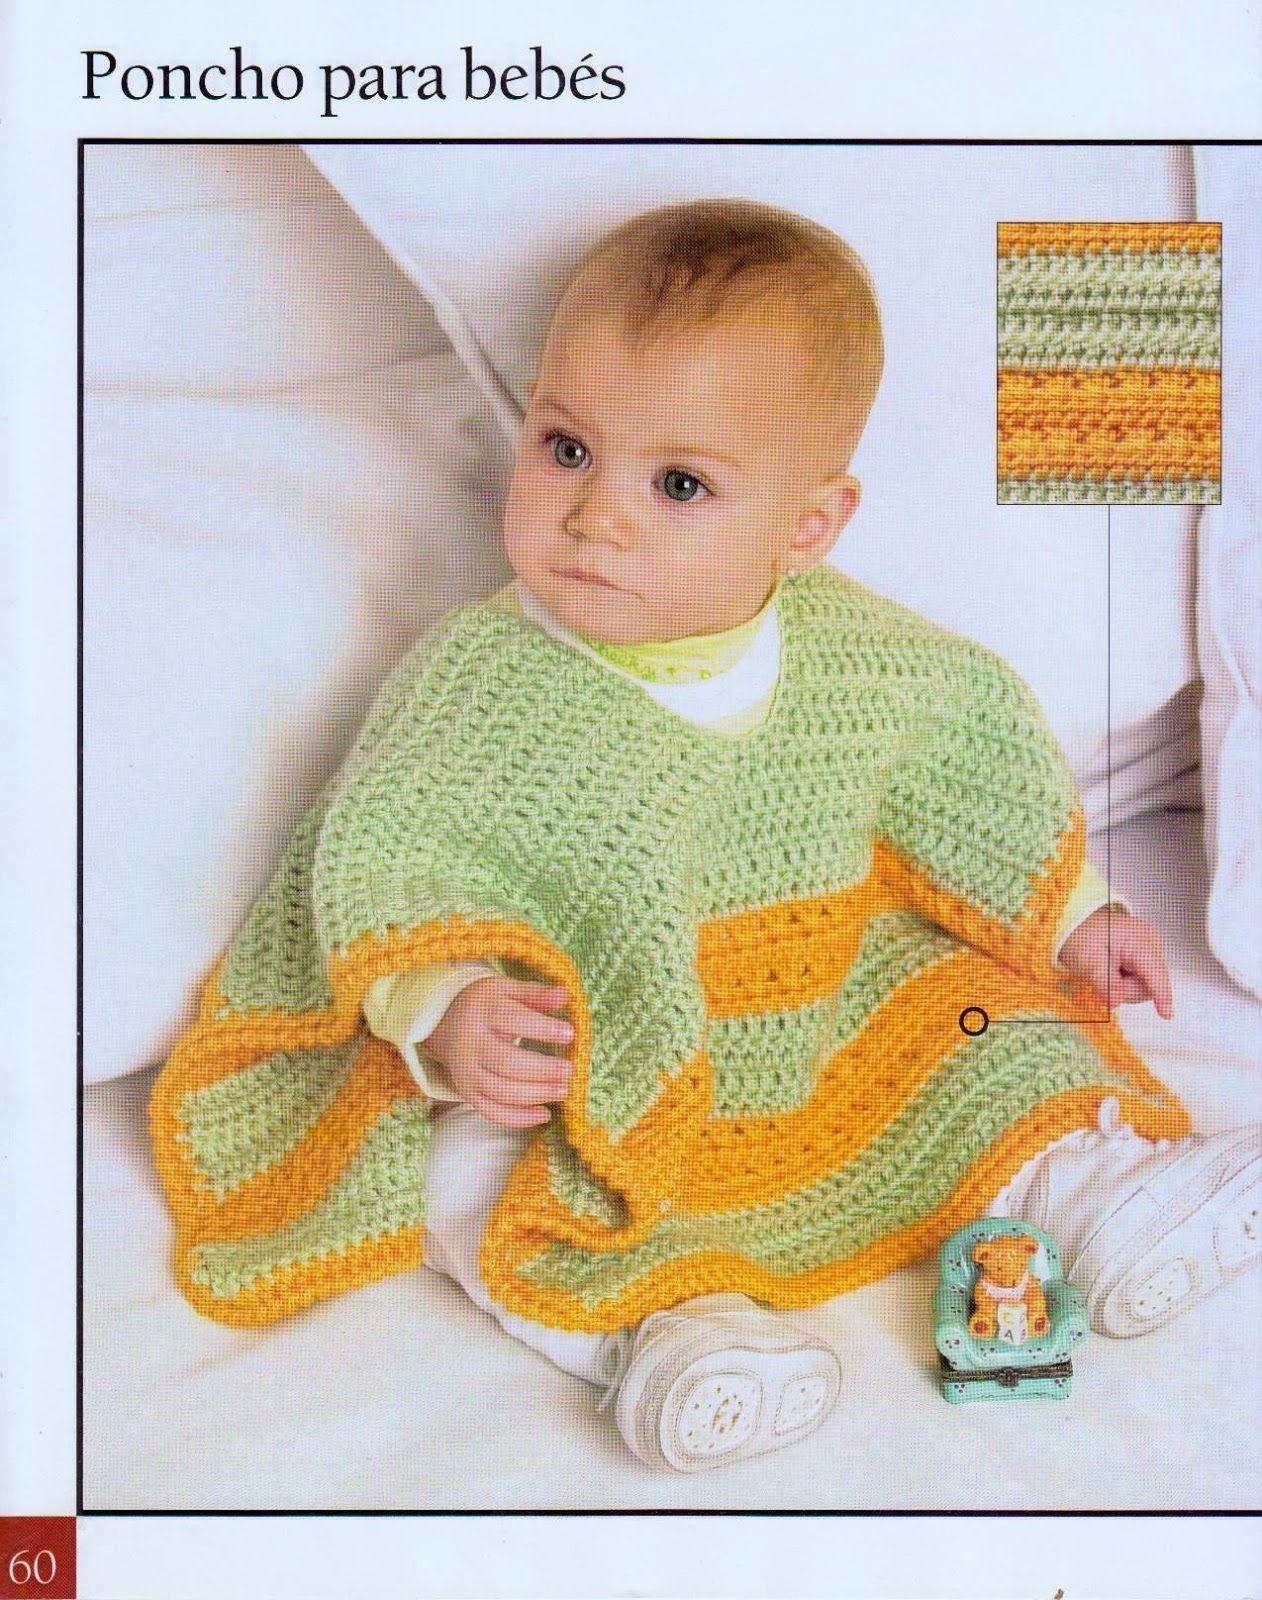 PONCHO PARA BEBÉS A CROCHET | Crochet | Pinterest | Poncho para bebé ...